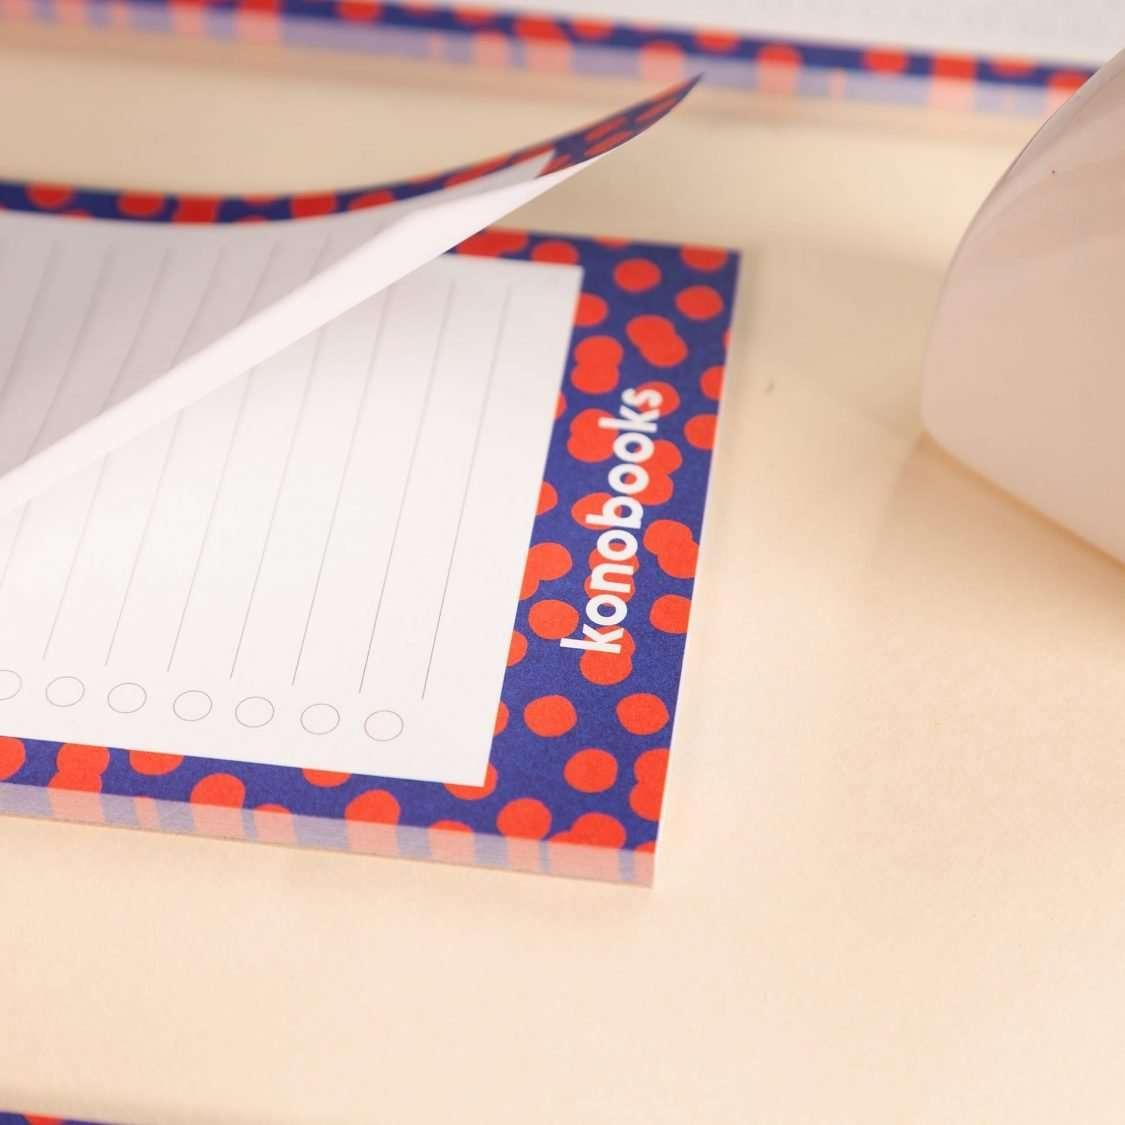 Block Notes Ecosostenibili - Konobooks